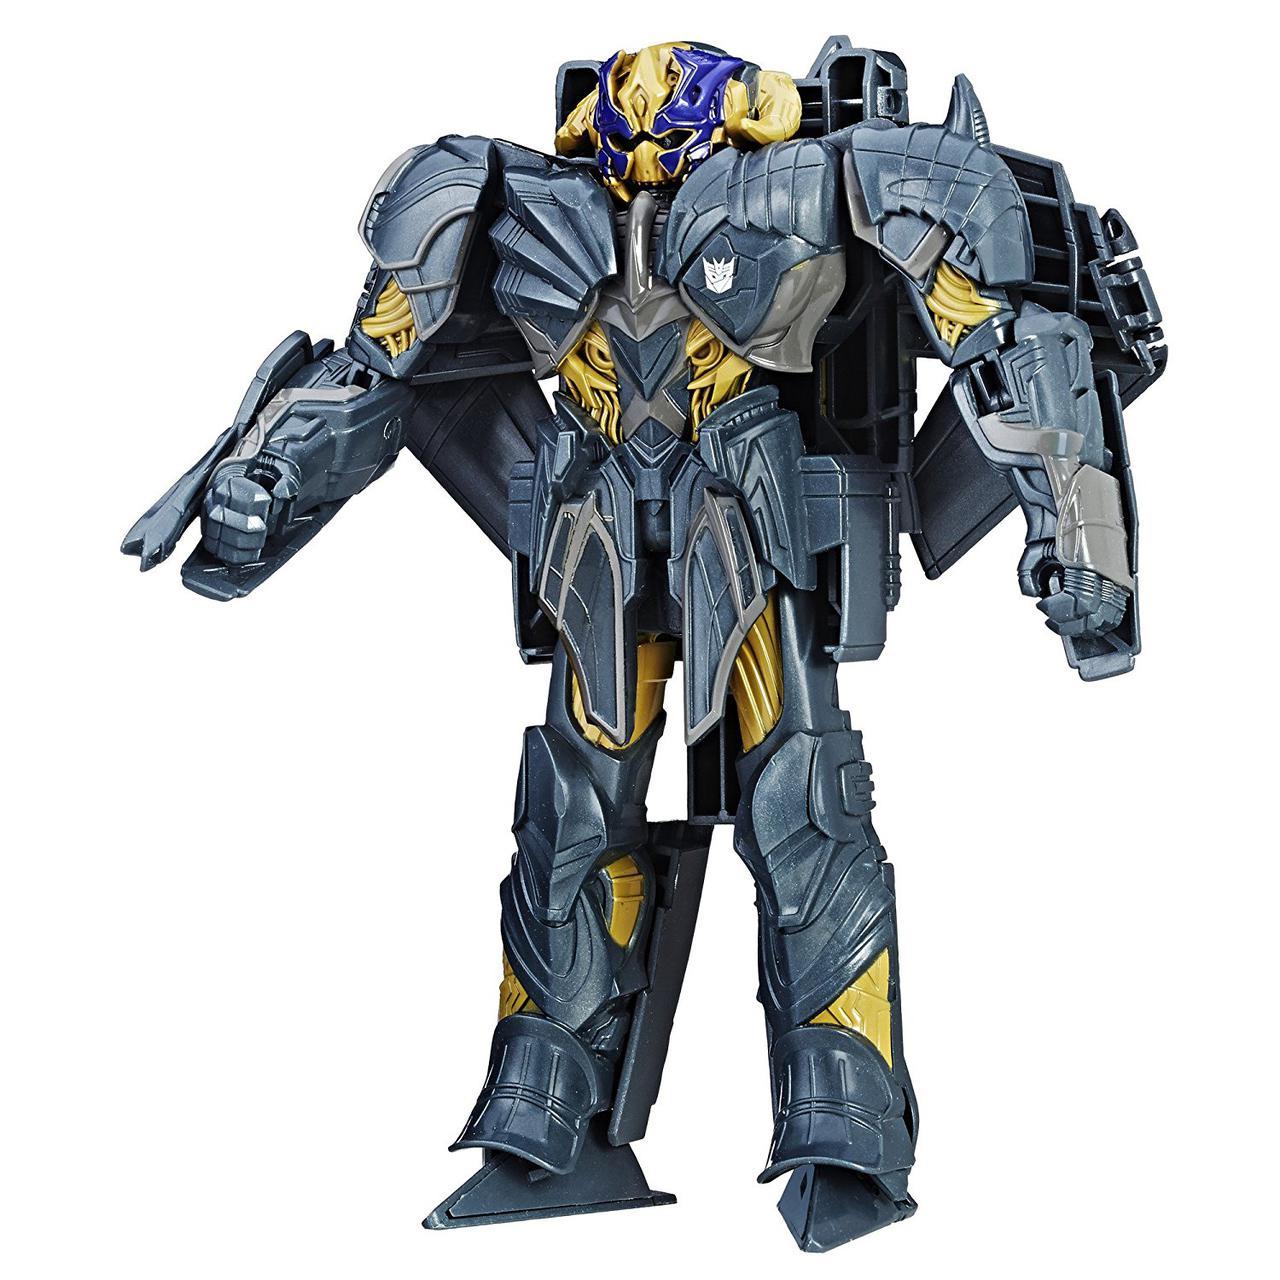 Трансформер Мегатрон Transformers MV5 Turbo Changer Megatron Action Figure Hasbro C2824